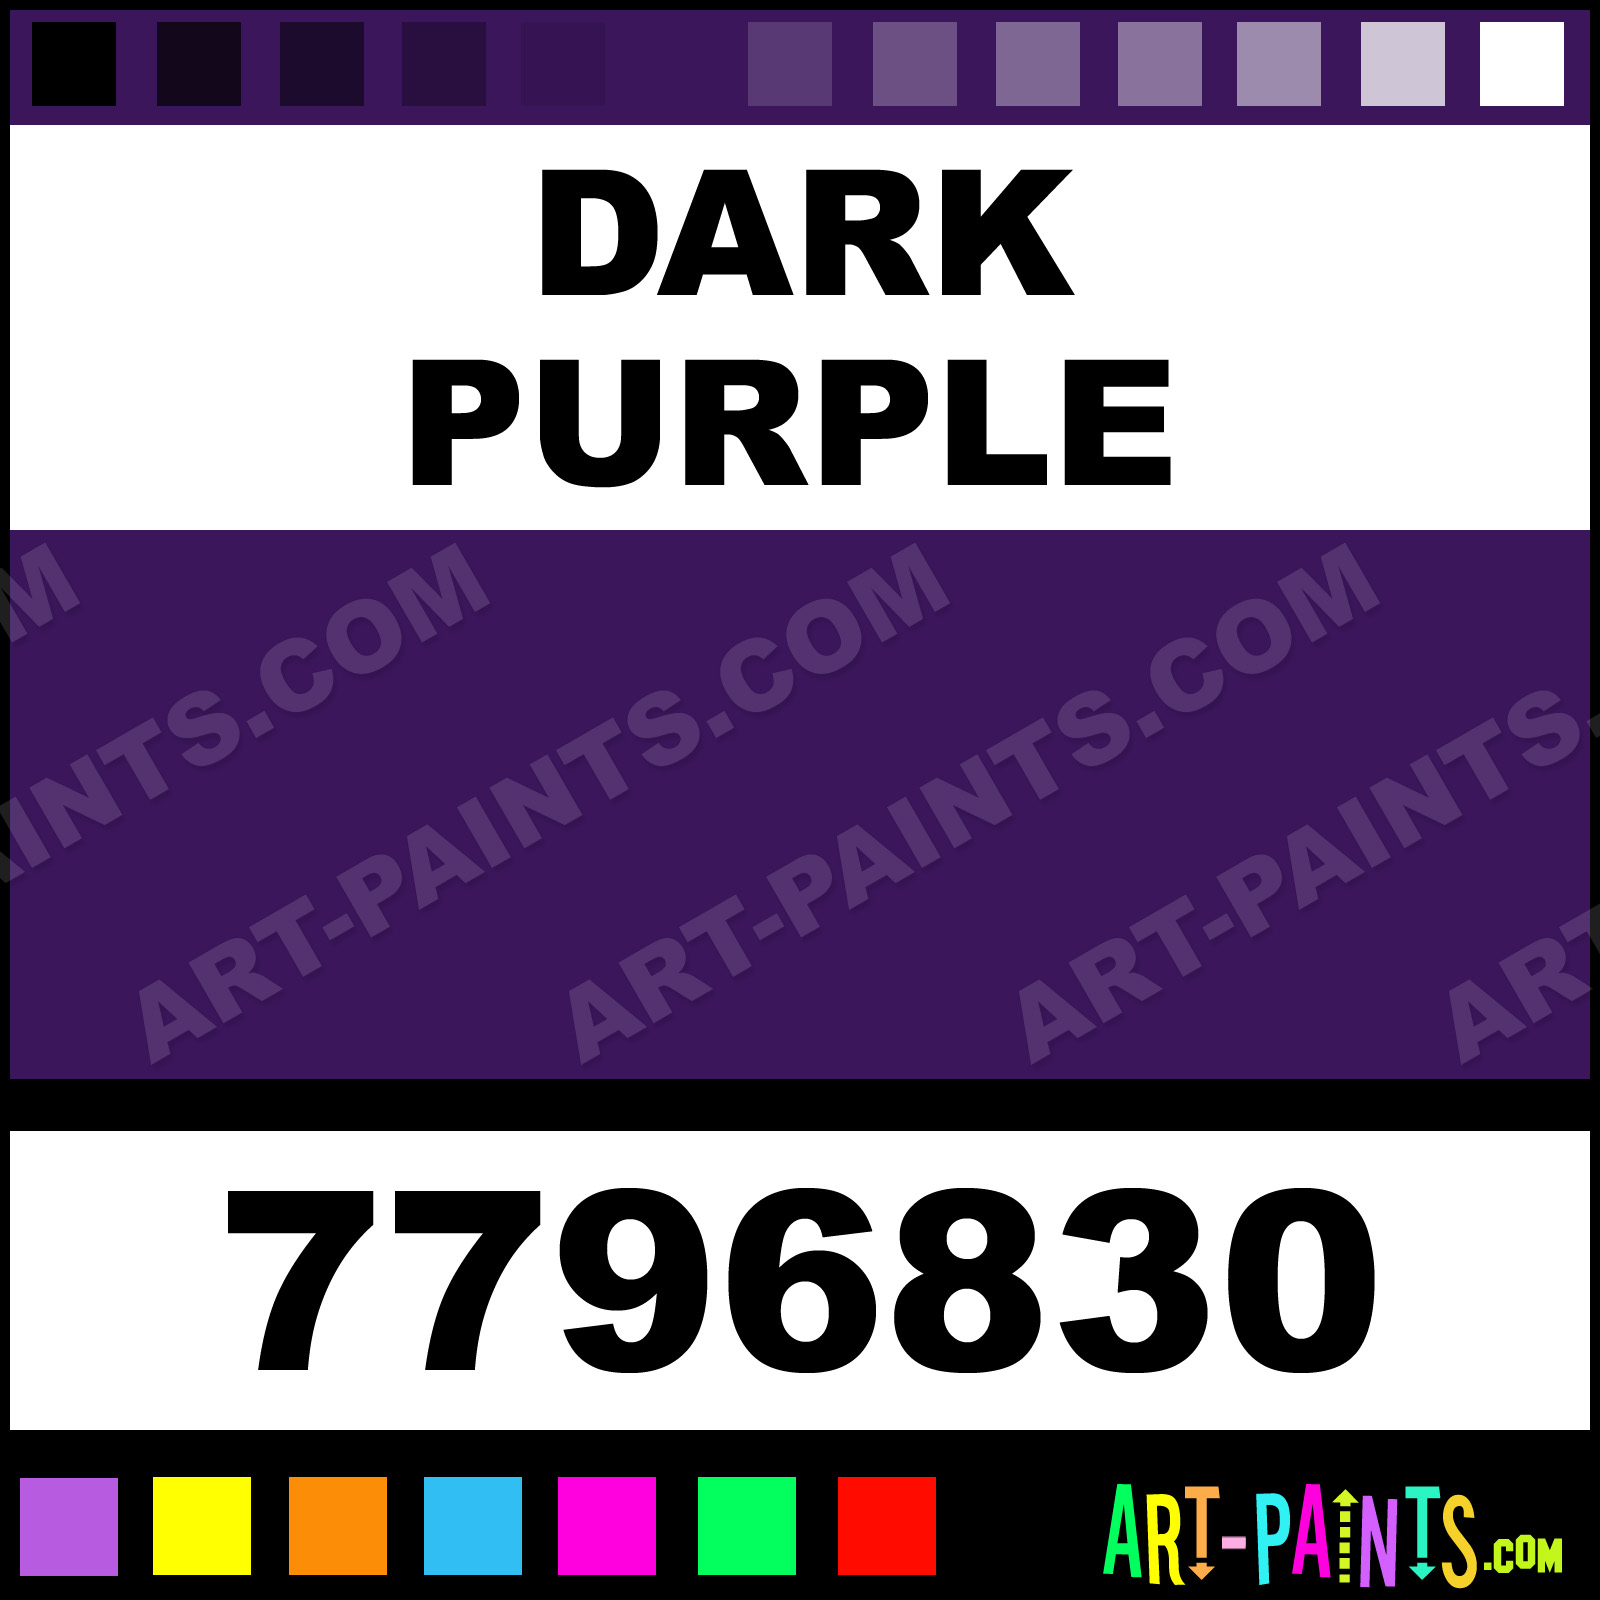 Dark Purple Gloss Protective Enamel Paints - 7796830 - Dark